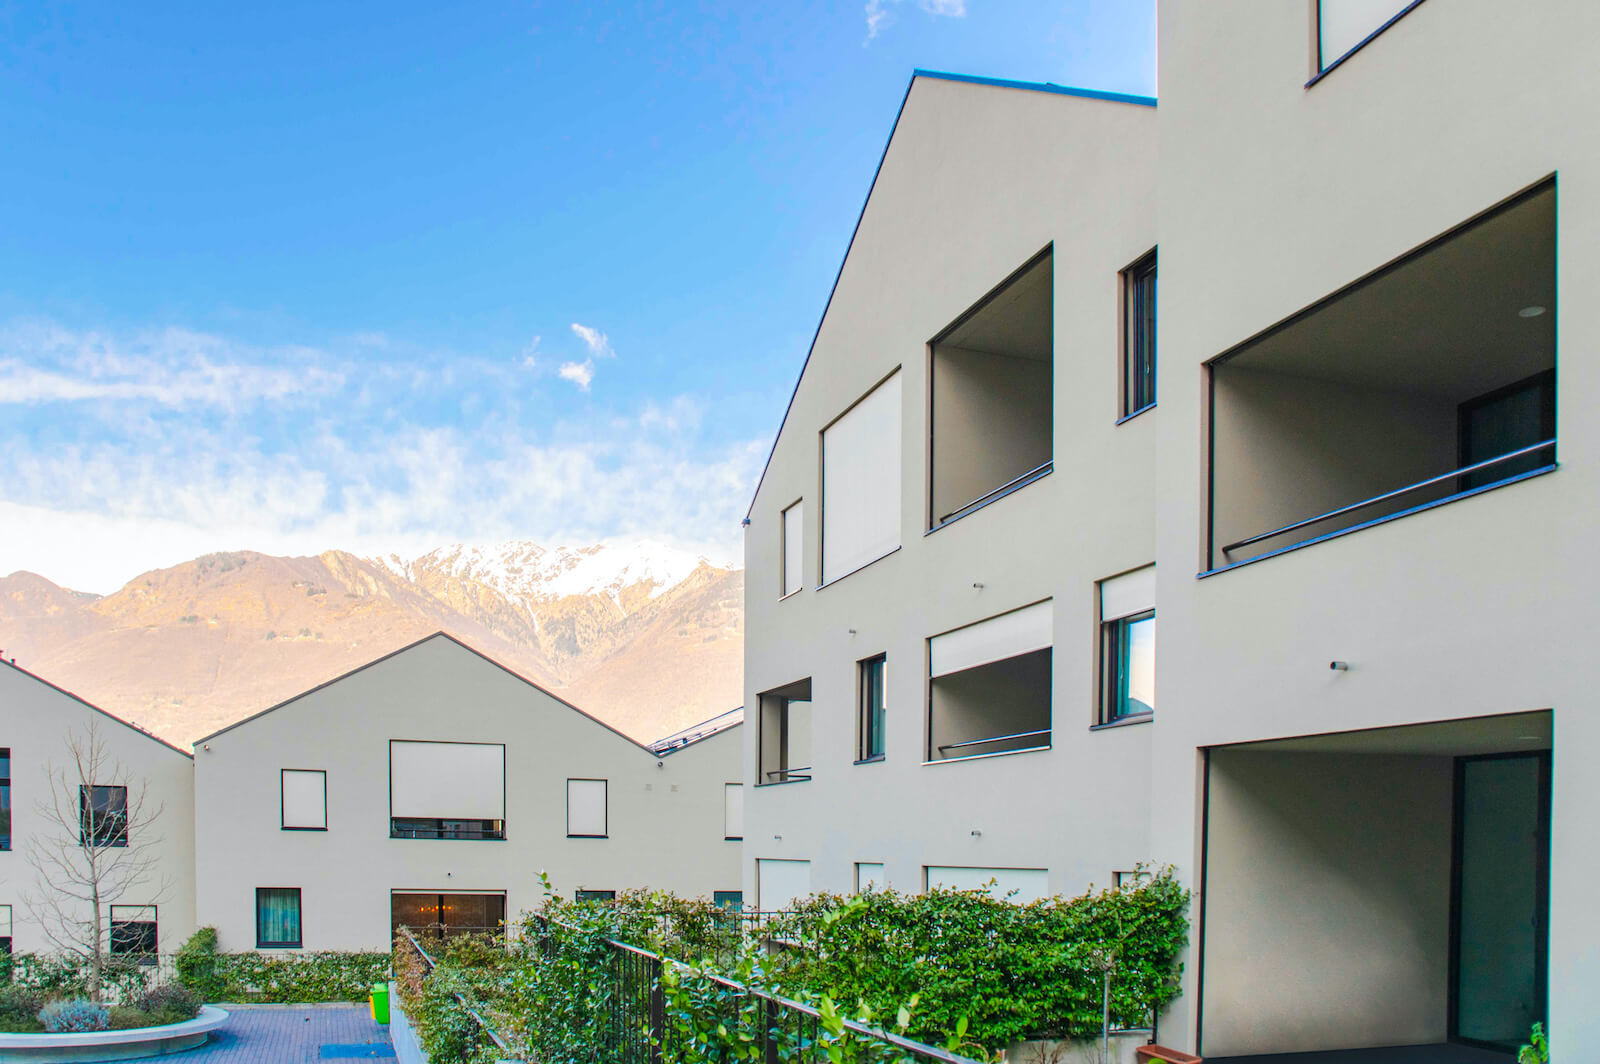 snb-immobiliare-residenza-andana-004